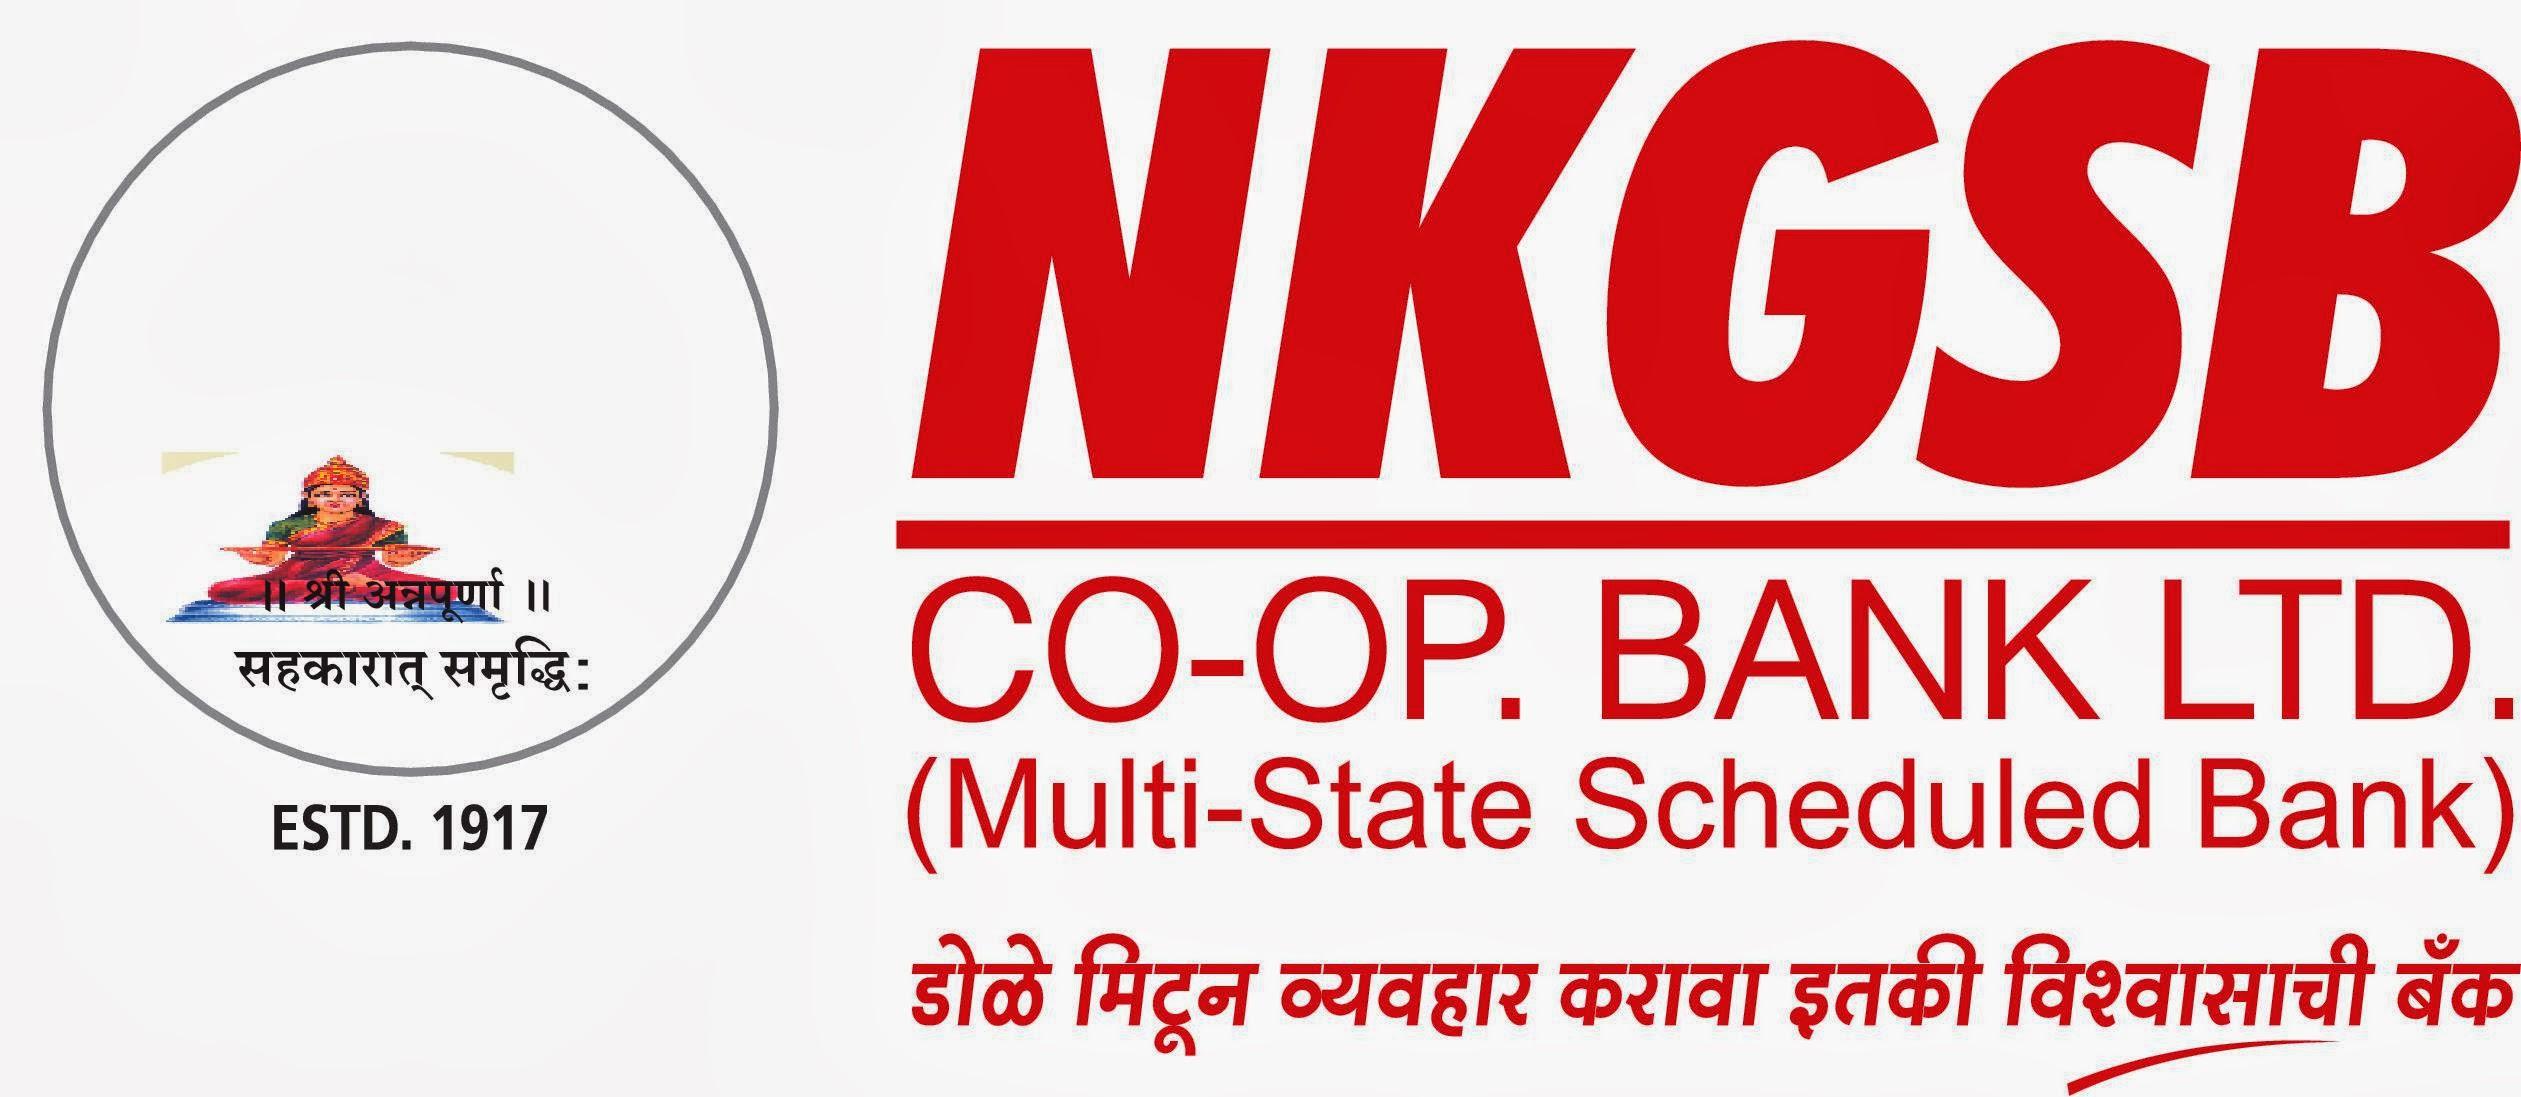 NKGSB CO-OP. BANK LTD_image0